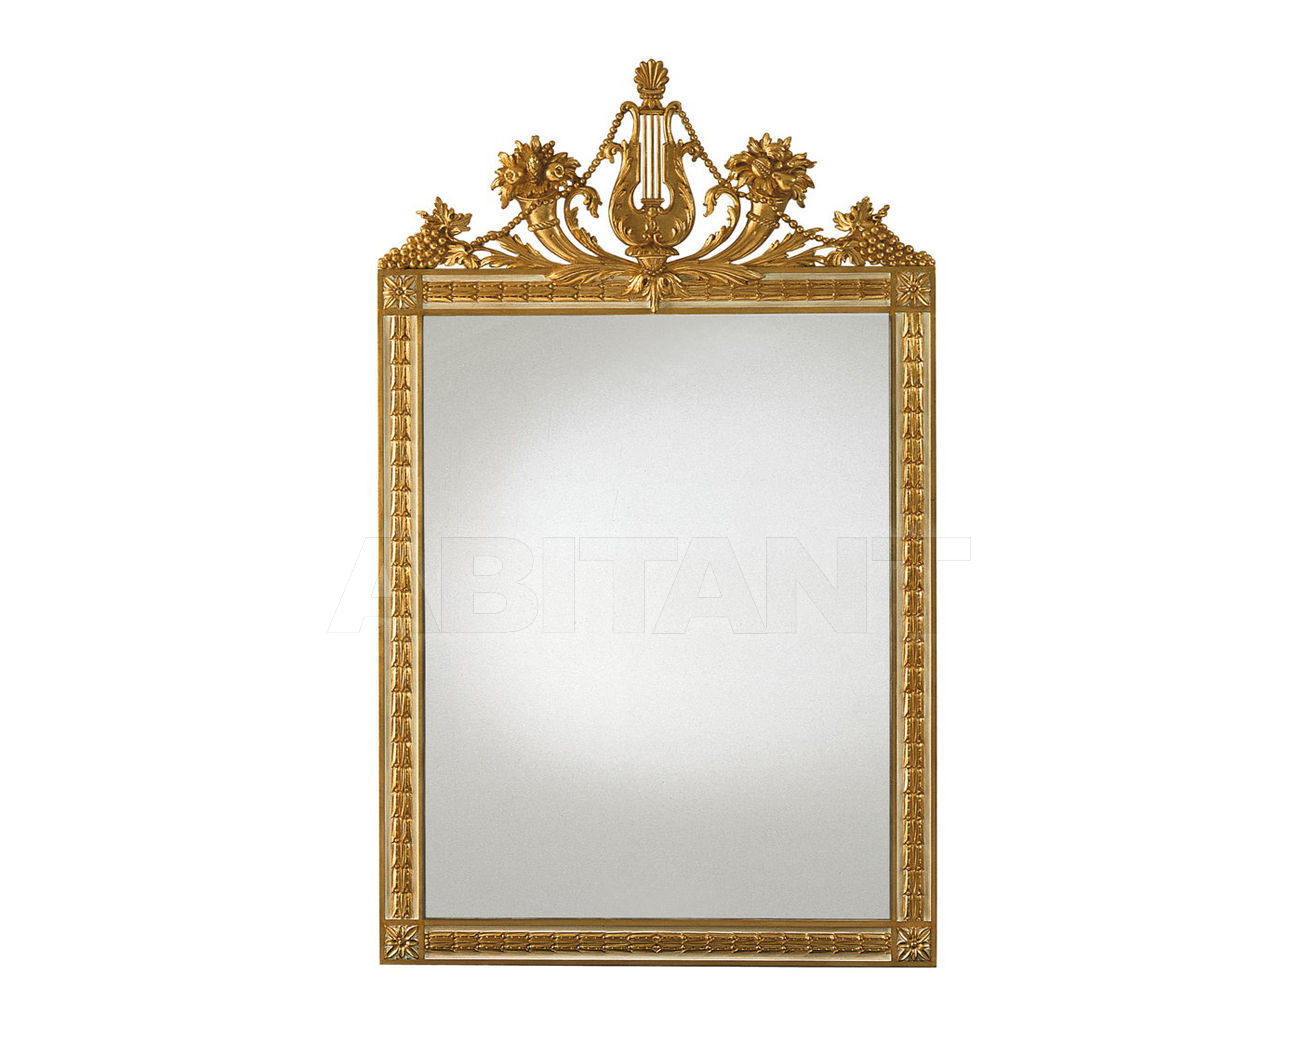 Купить Зеркало настенное Colombostile s.p.a. 2010 0103 SP